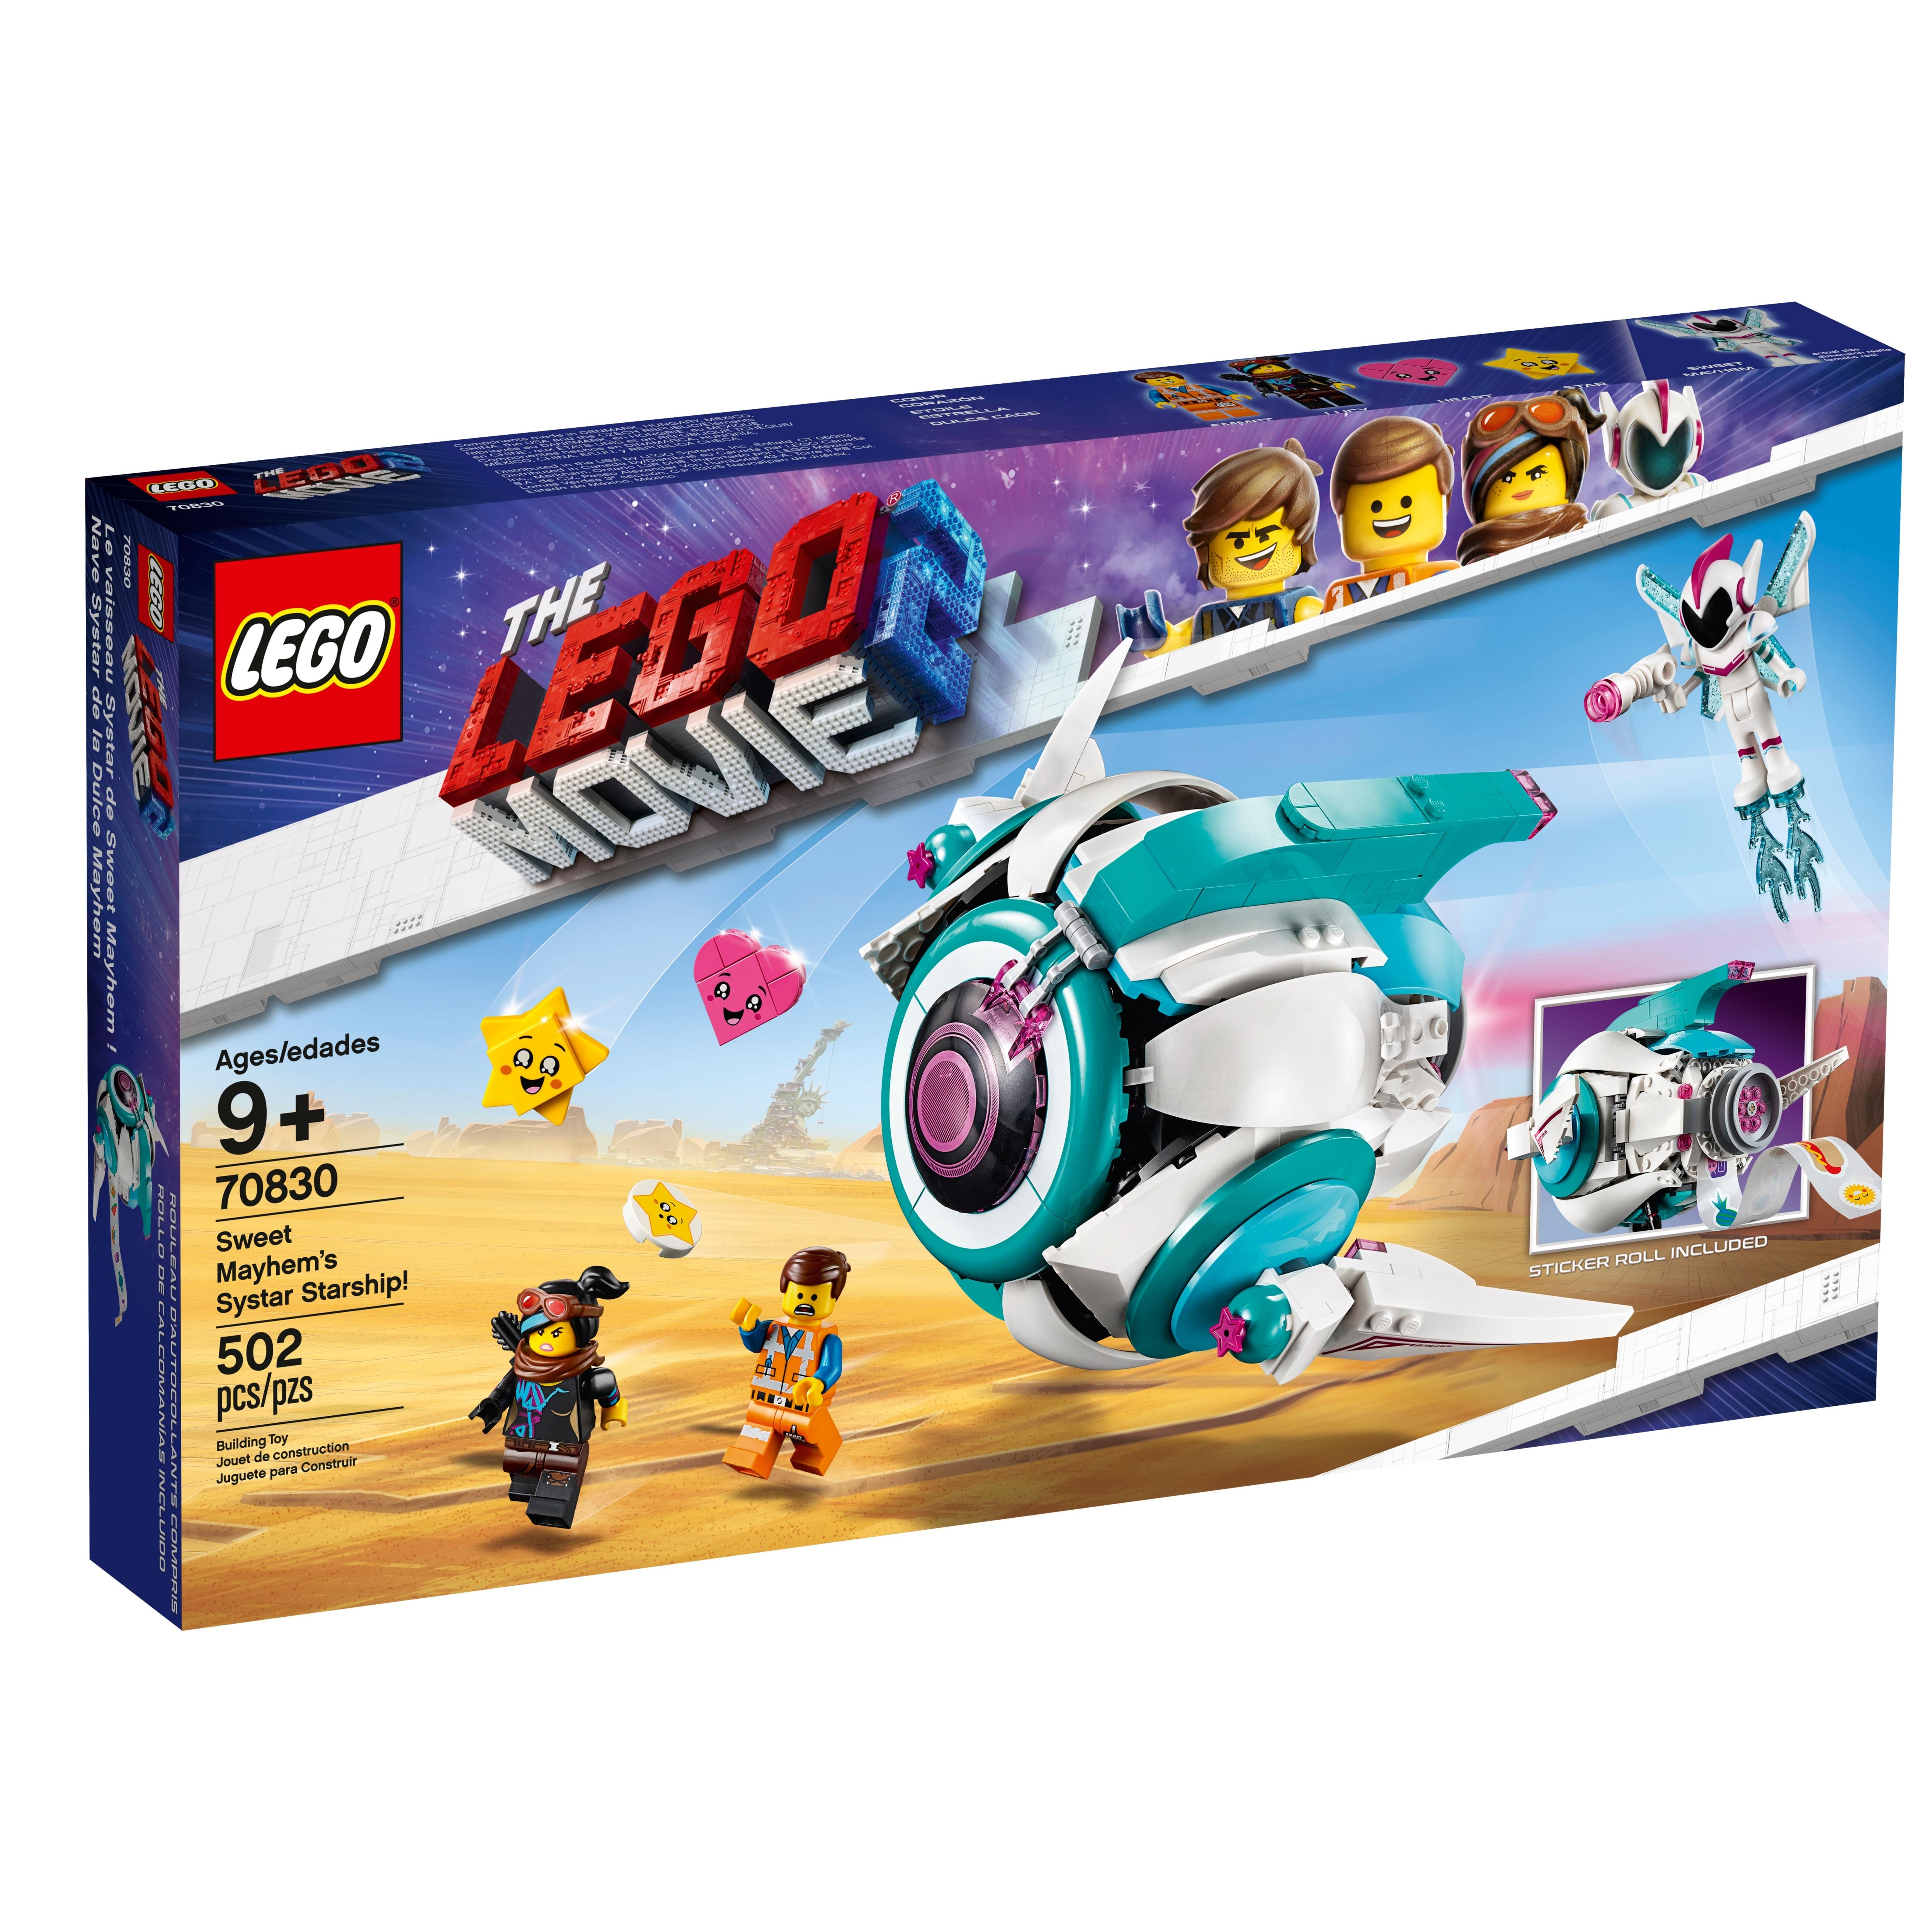 70830 NIB LEGO® Lego Movie 2 Sweet Mayhem/'s Systar Starship